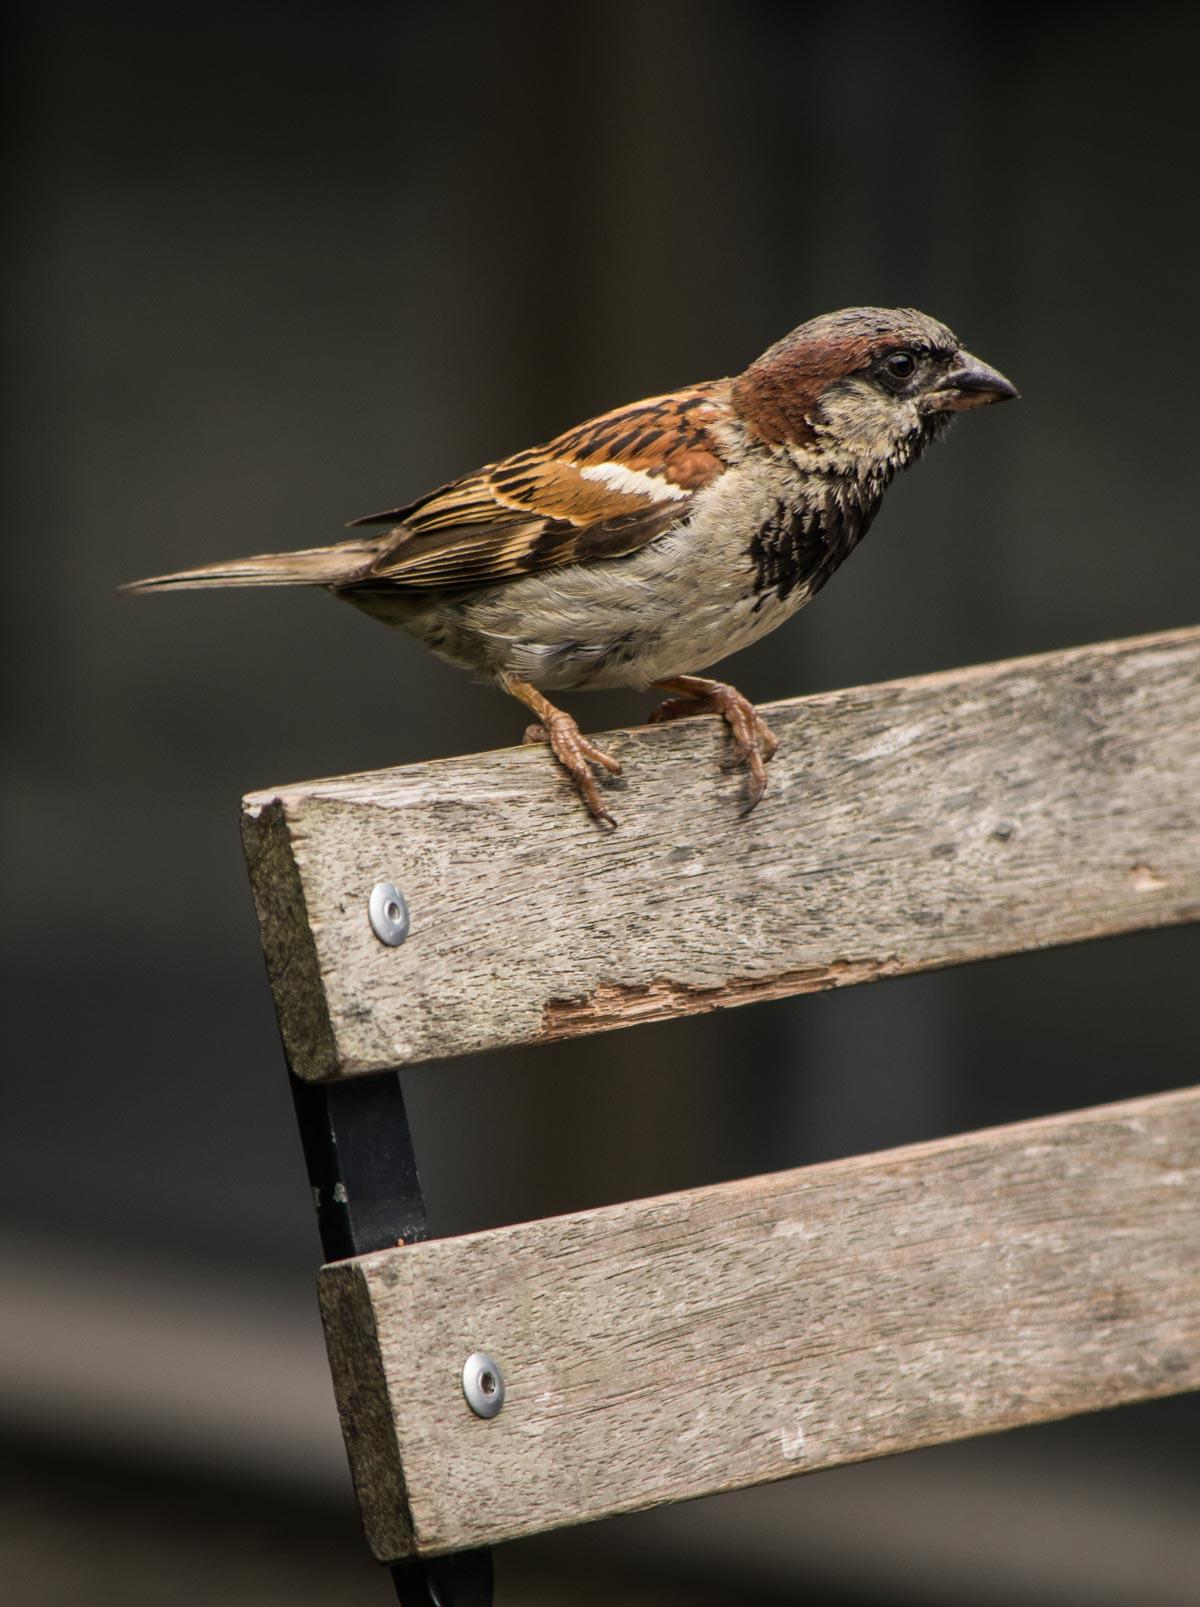 Pukaha-Sparrow Pukaha Mount Bruce: National Wildlife Centre, New Zealand